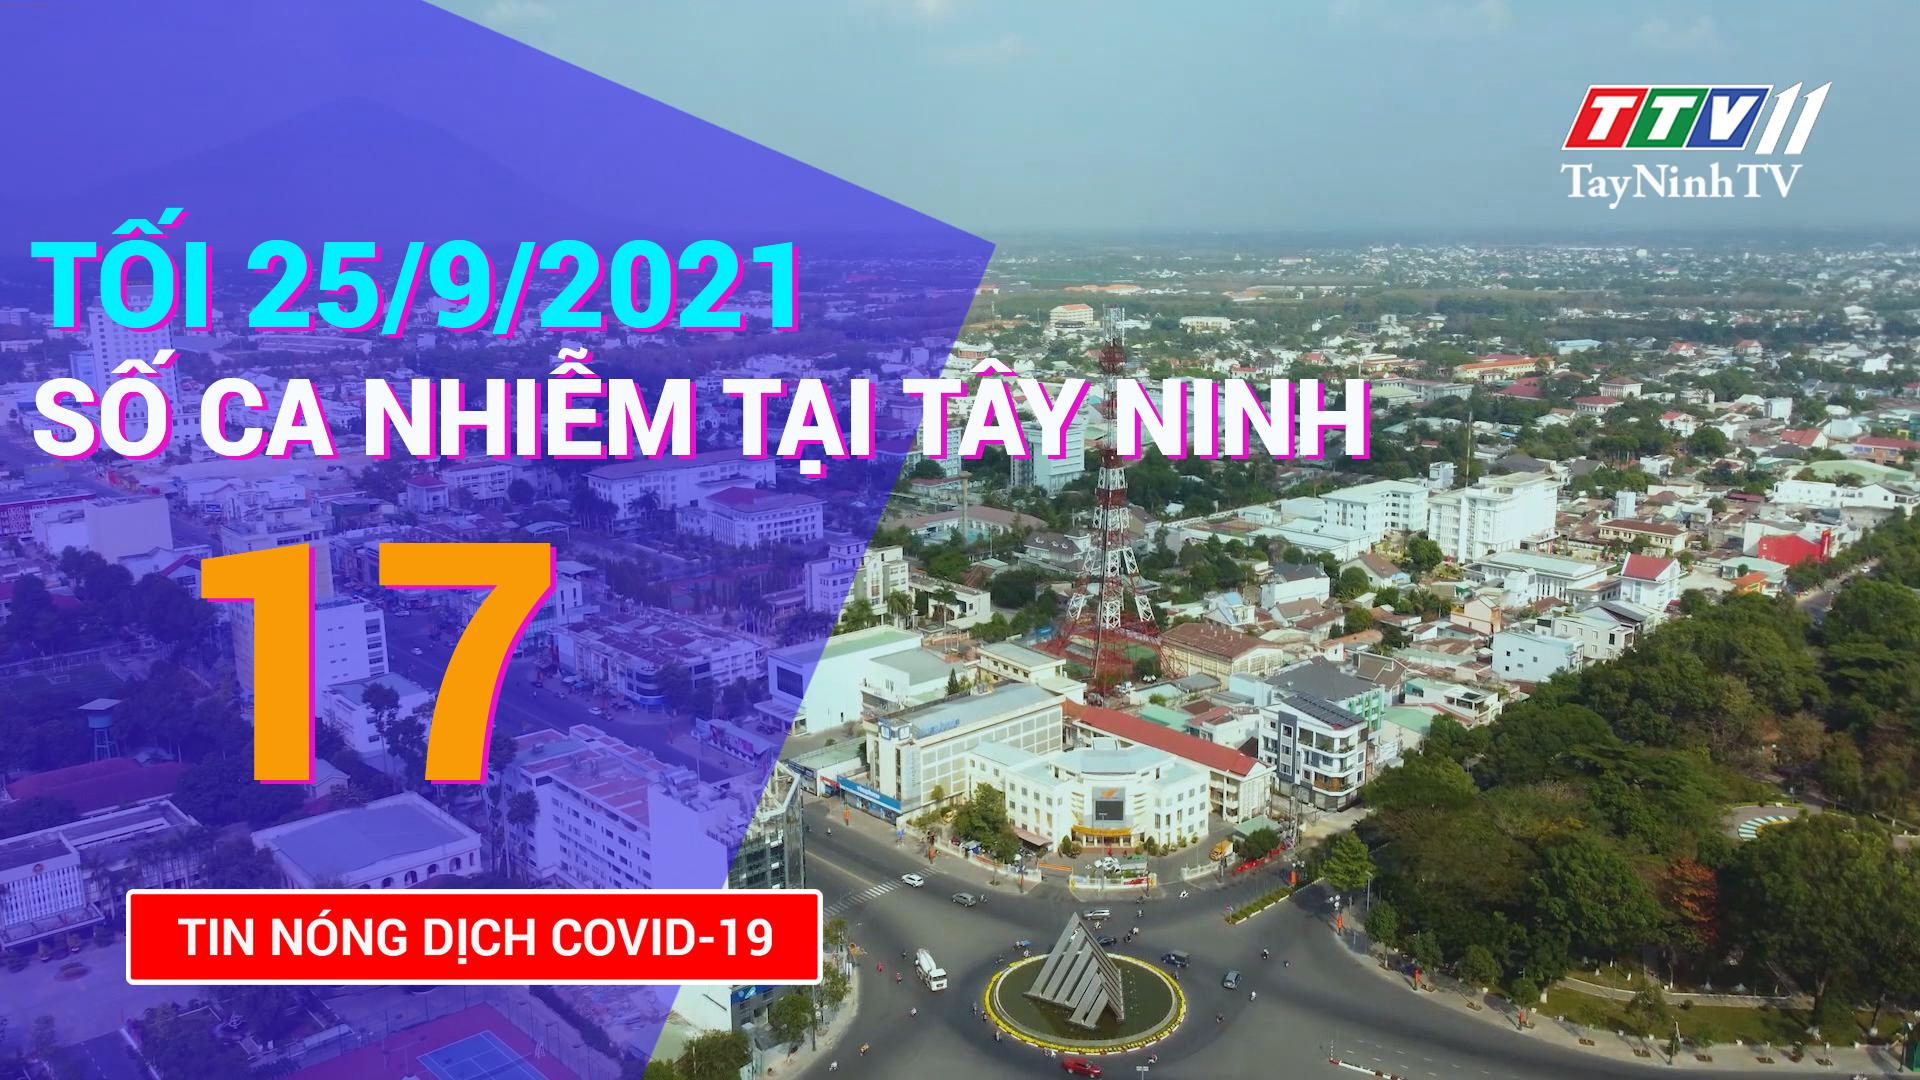 Tin tức Covid-19 tối 25/9/2021 | TayNinhTV